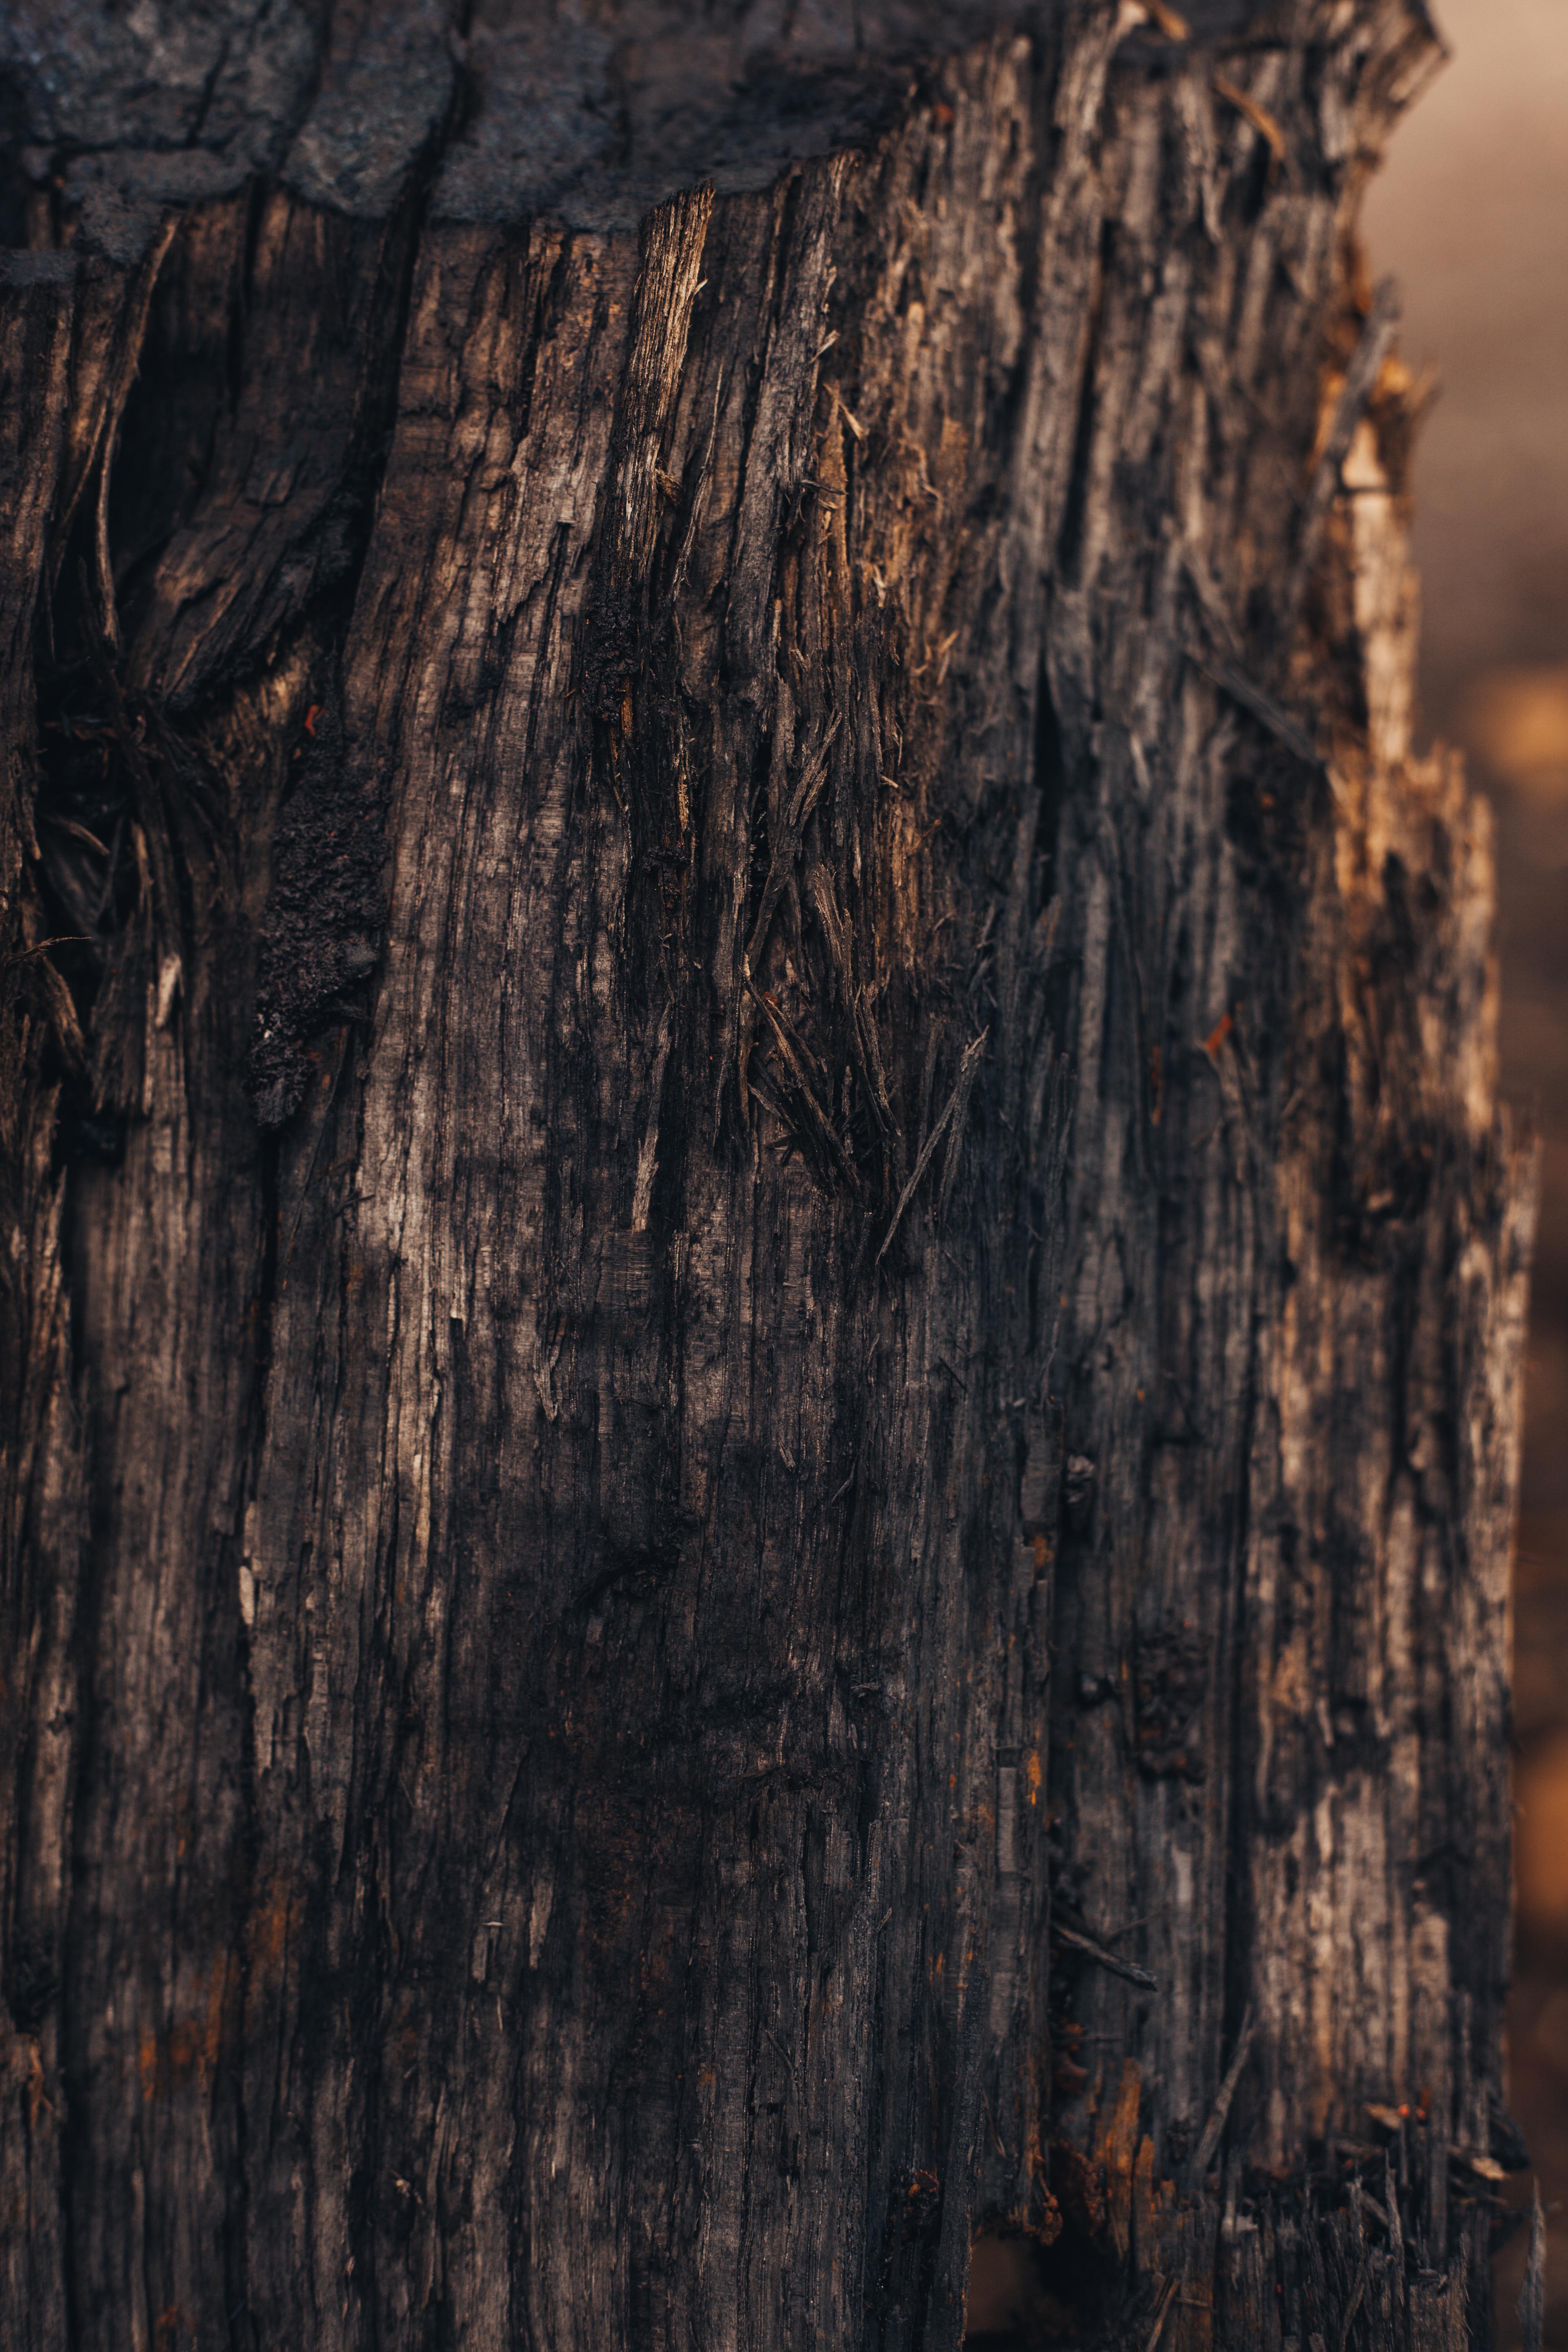 Black Wood Texture, Dark, Gloomy, Grunge, Grungy, HQ Photo